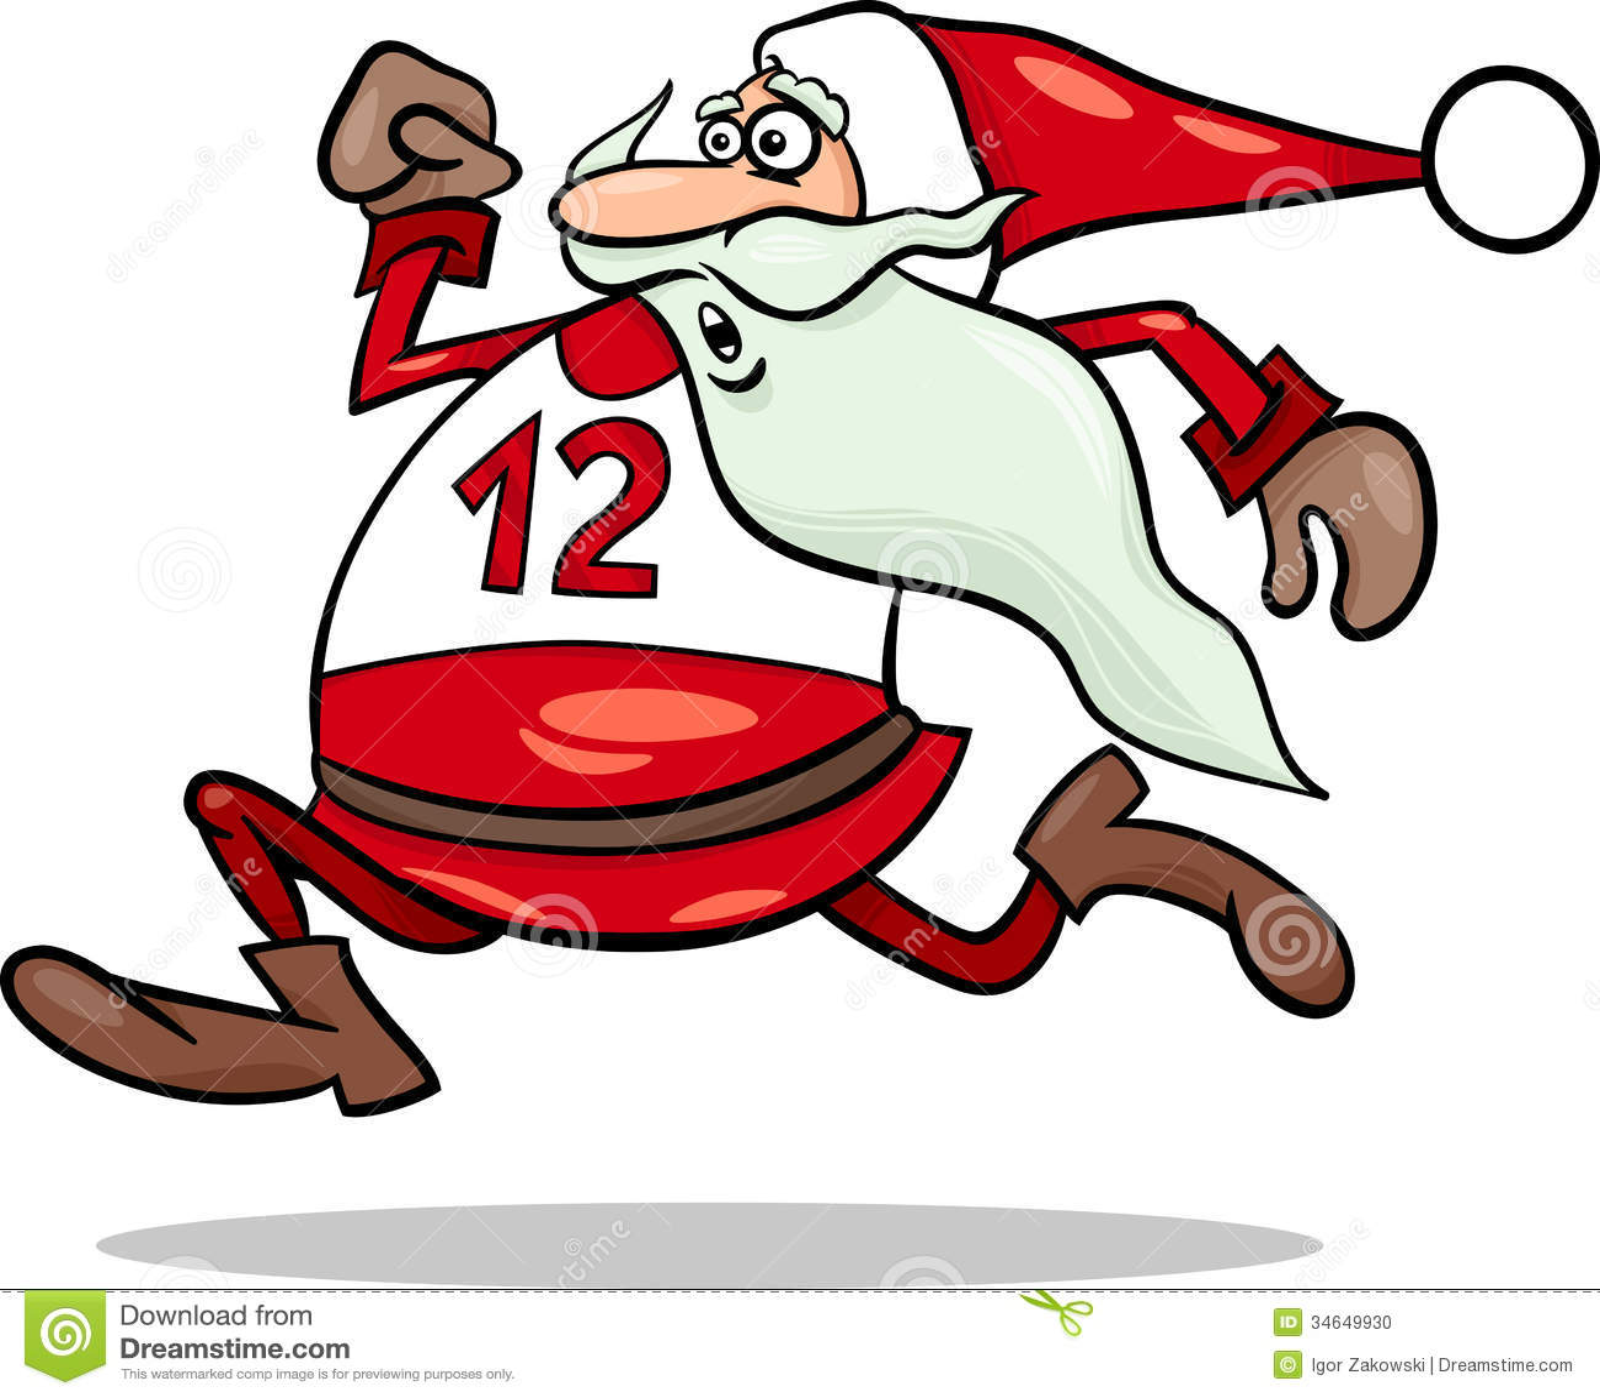 Cartoon Illustration of Funny Running Santa Claus Character Santa Jogging